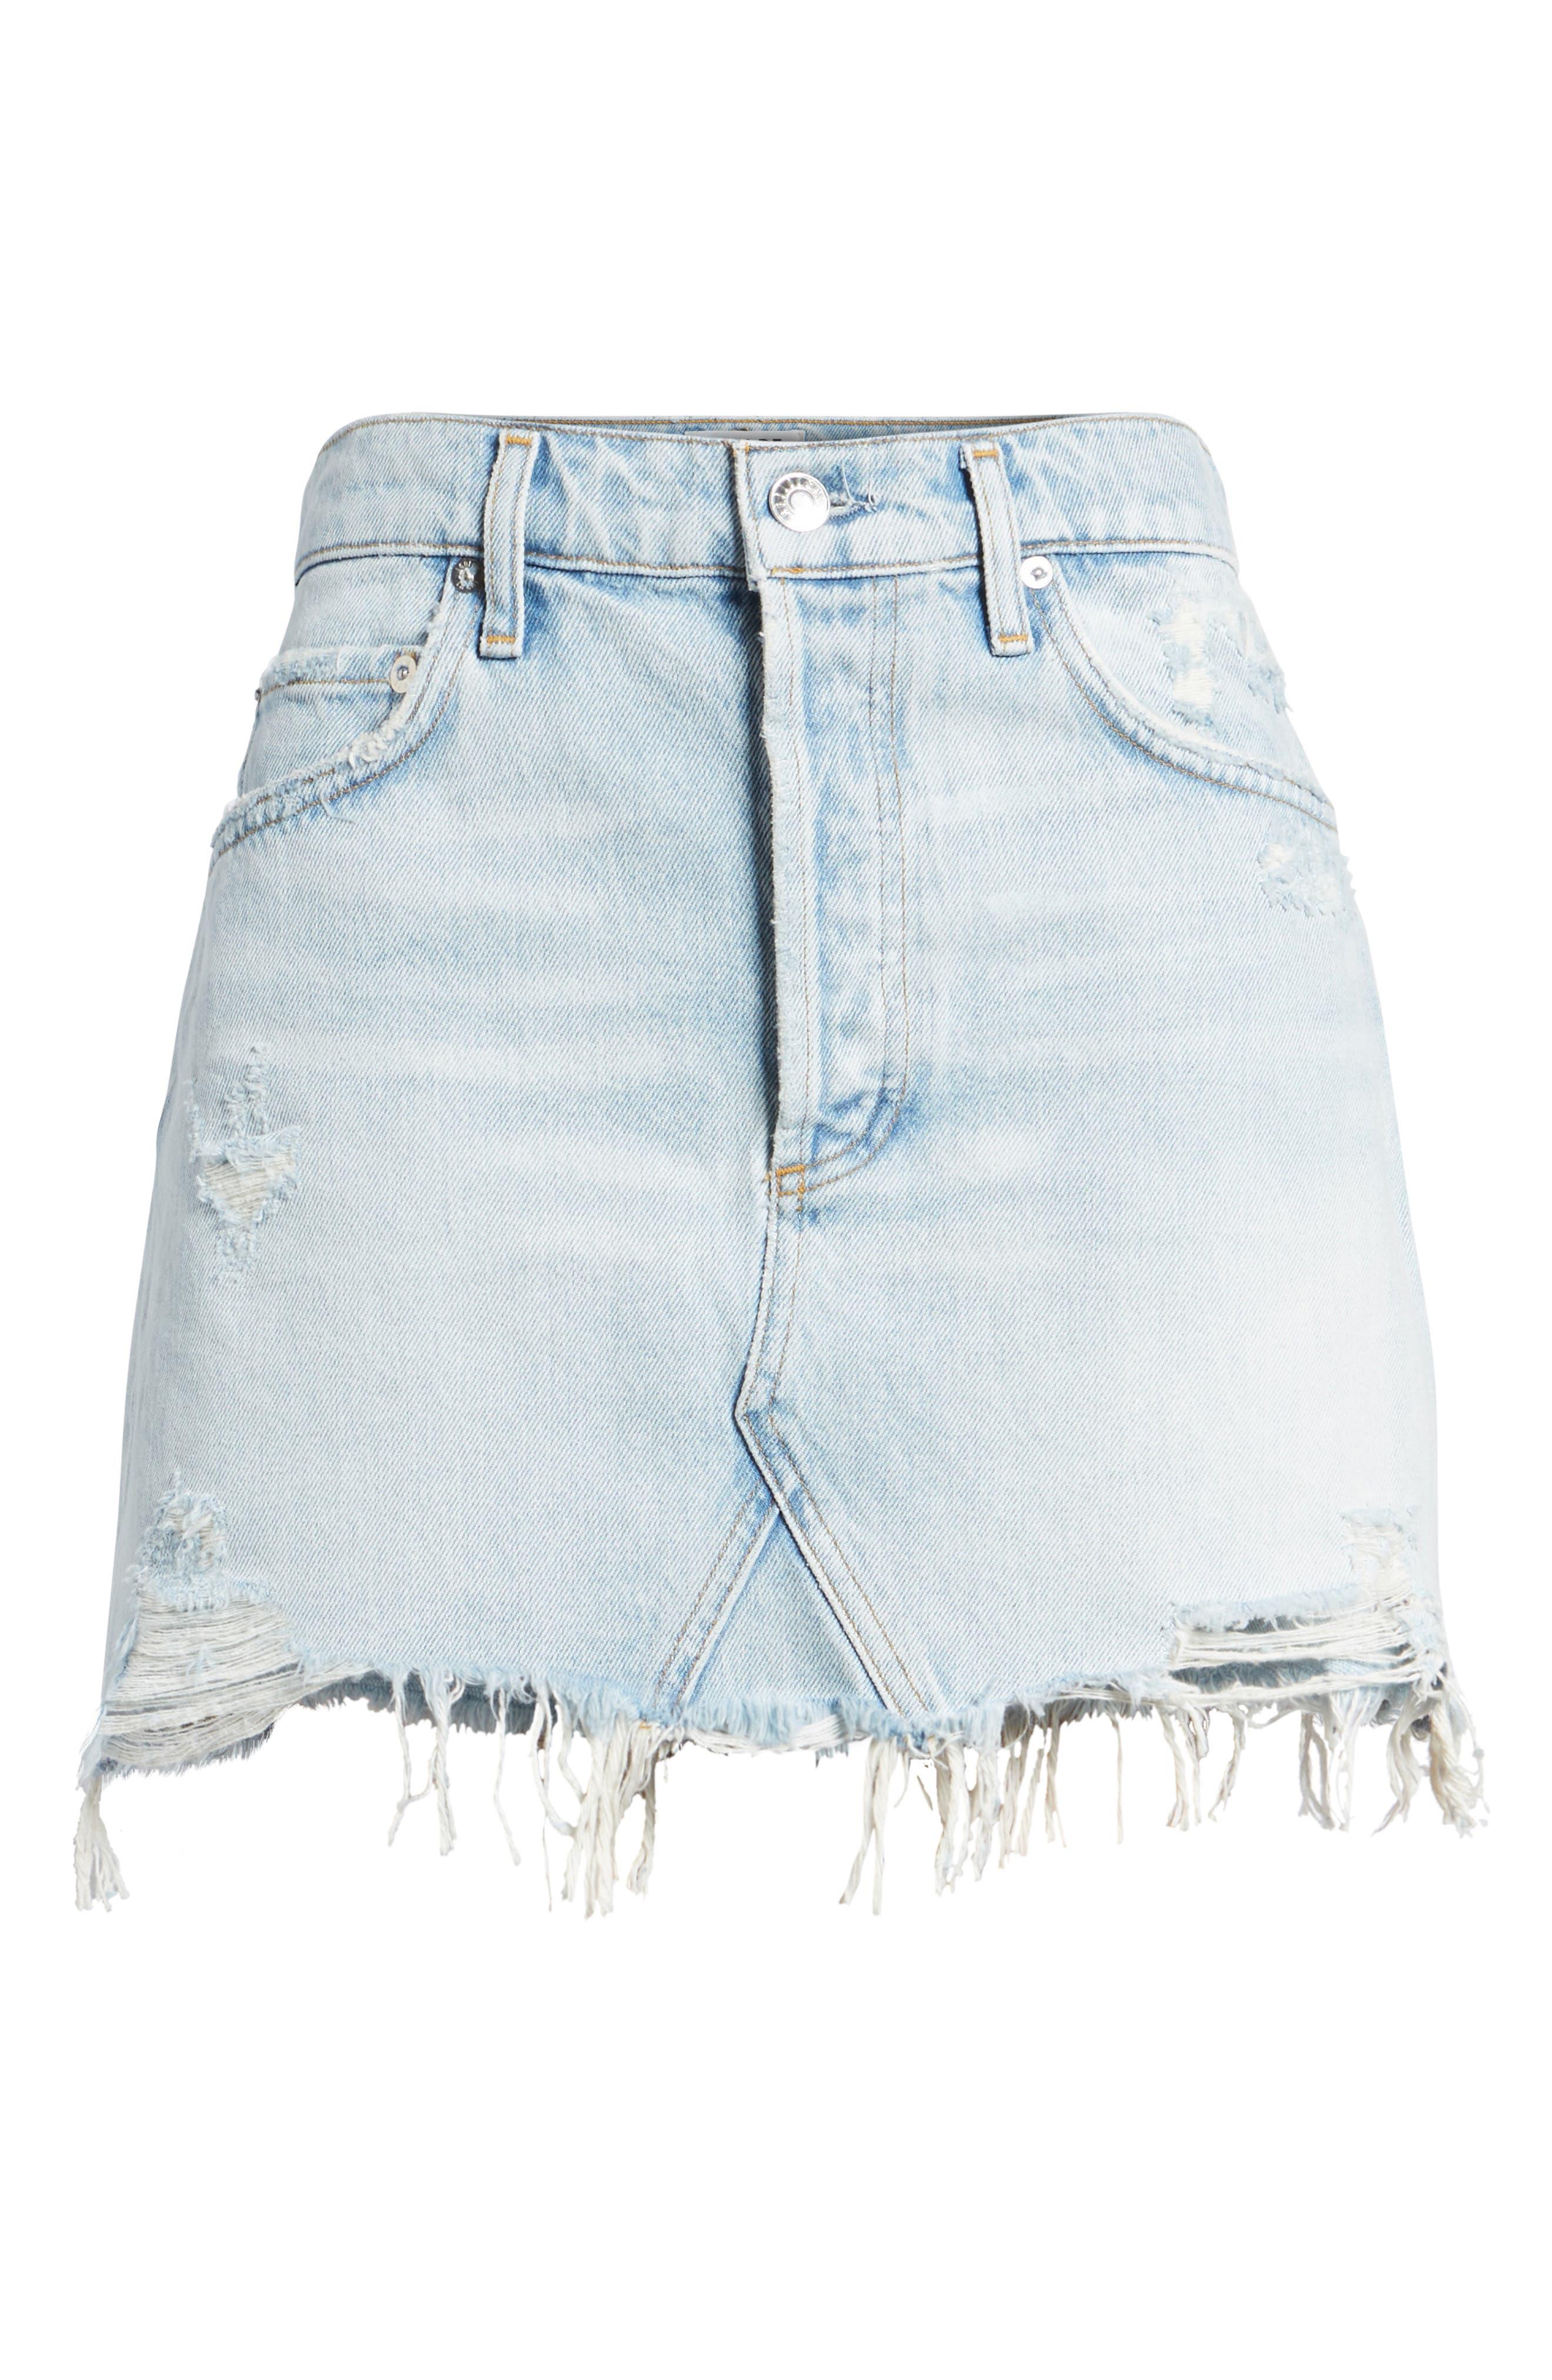 Quinn High Waist Cutoff Denim Miniskirt,                             Alternate thumbnail 6, color,                             Vega